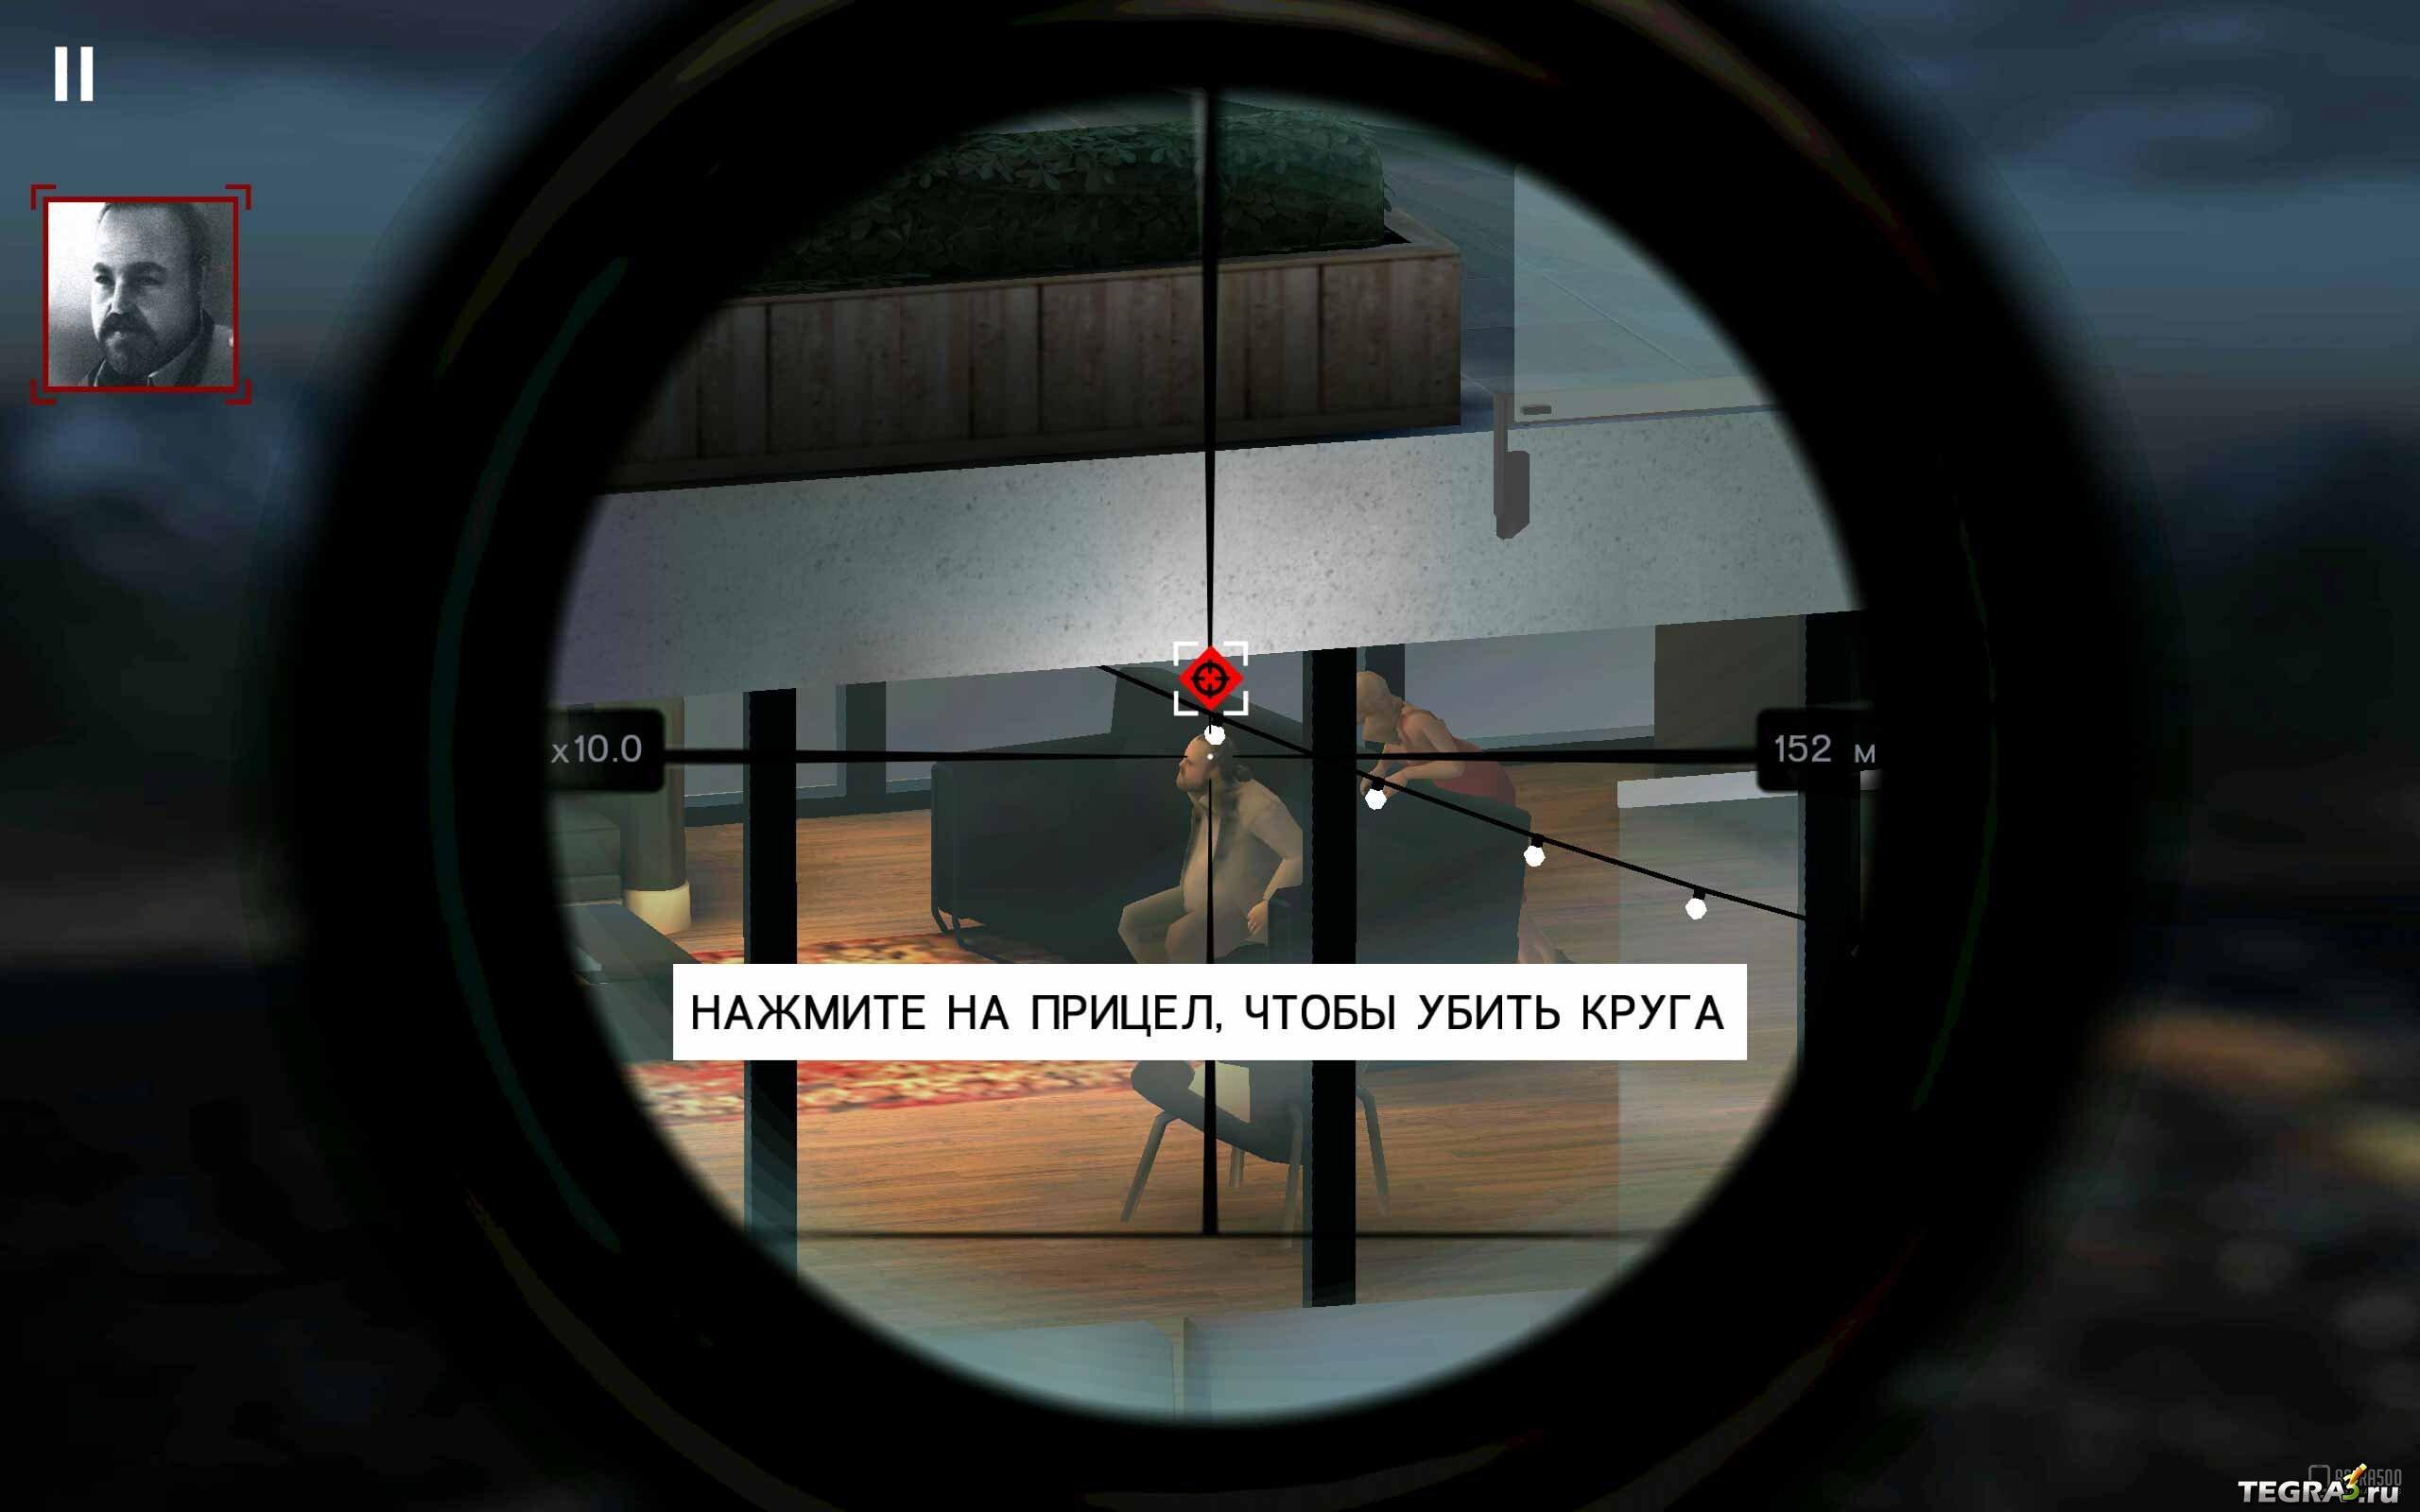 Скачать Hitman Снайпер (Hitman Sniper) на …